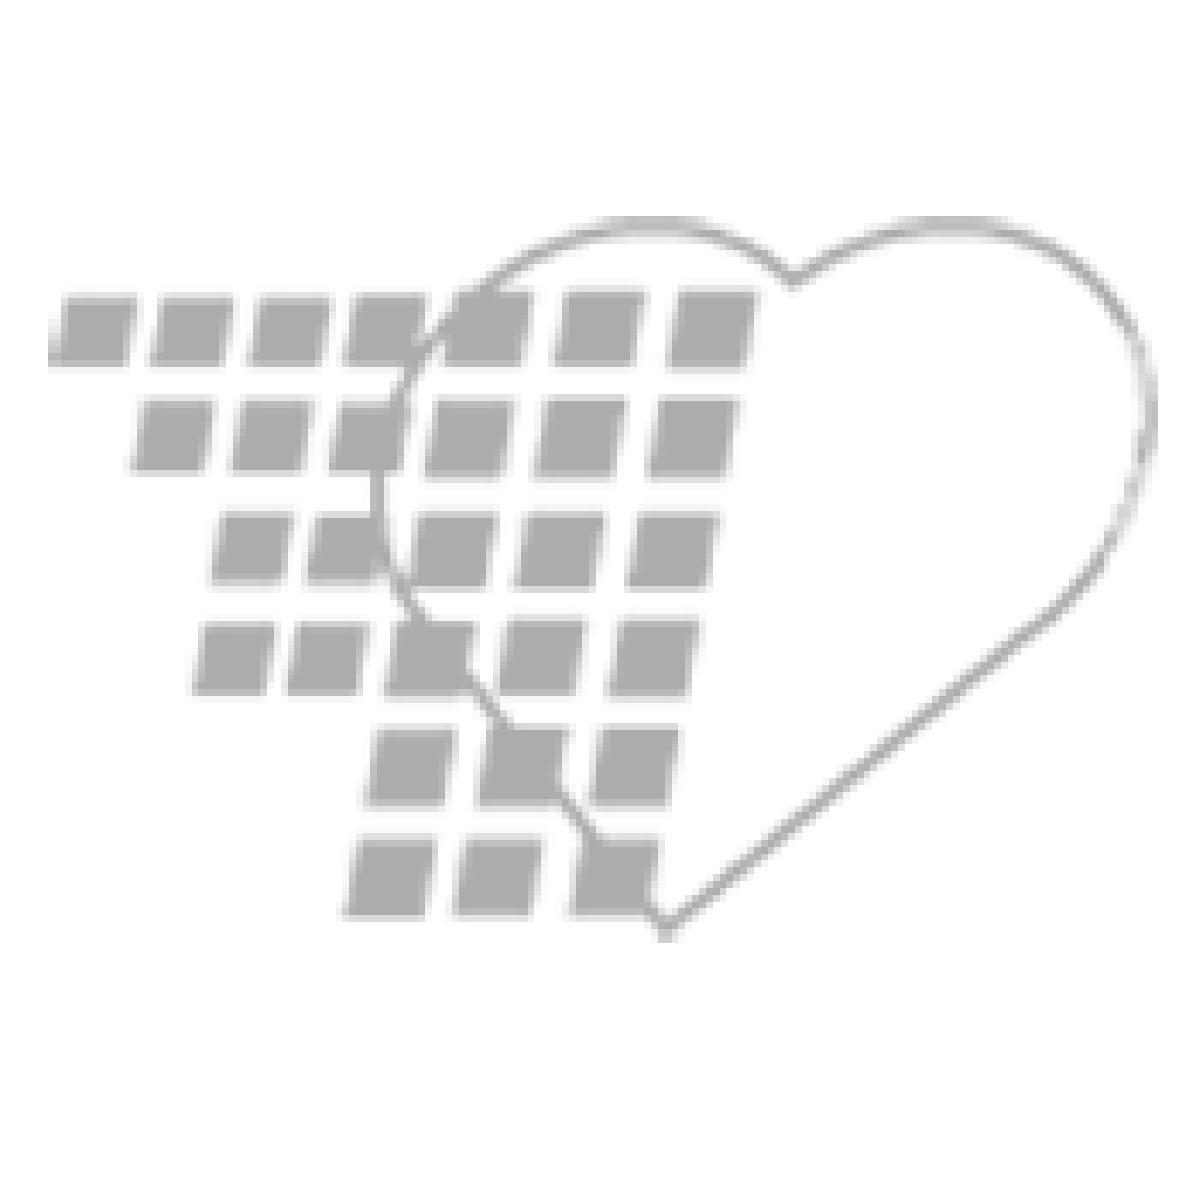 14-17-0796 Nasco Life/form® Shingles Rashes